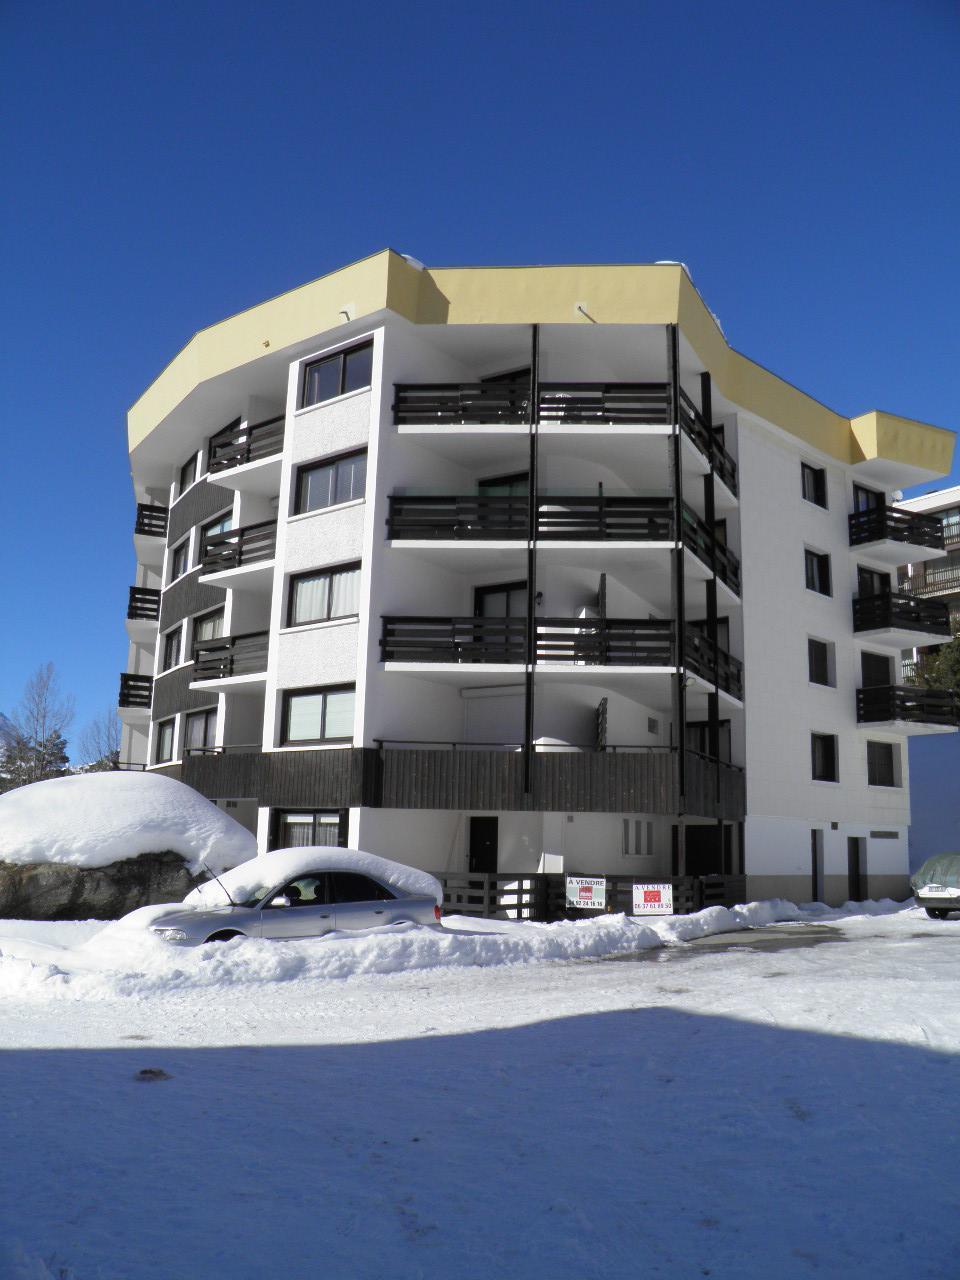 Location Residence L'yret